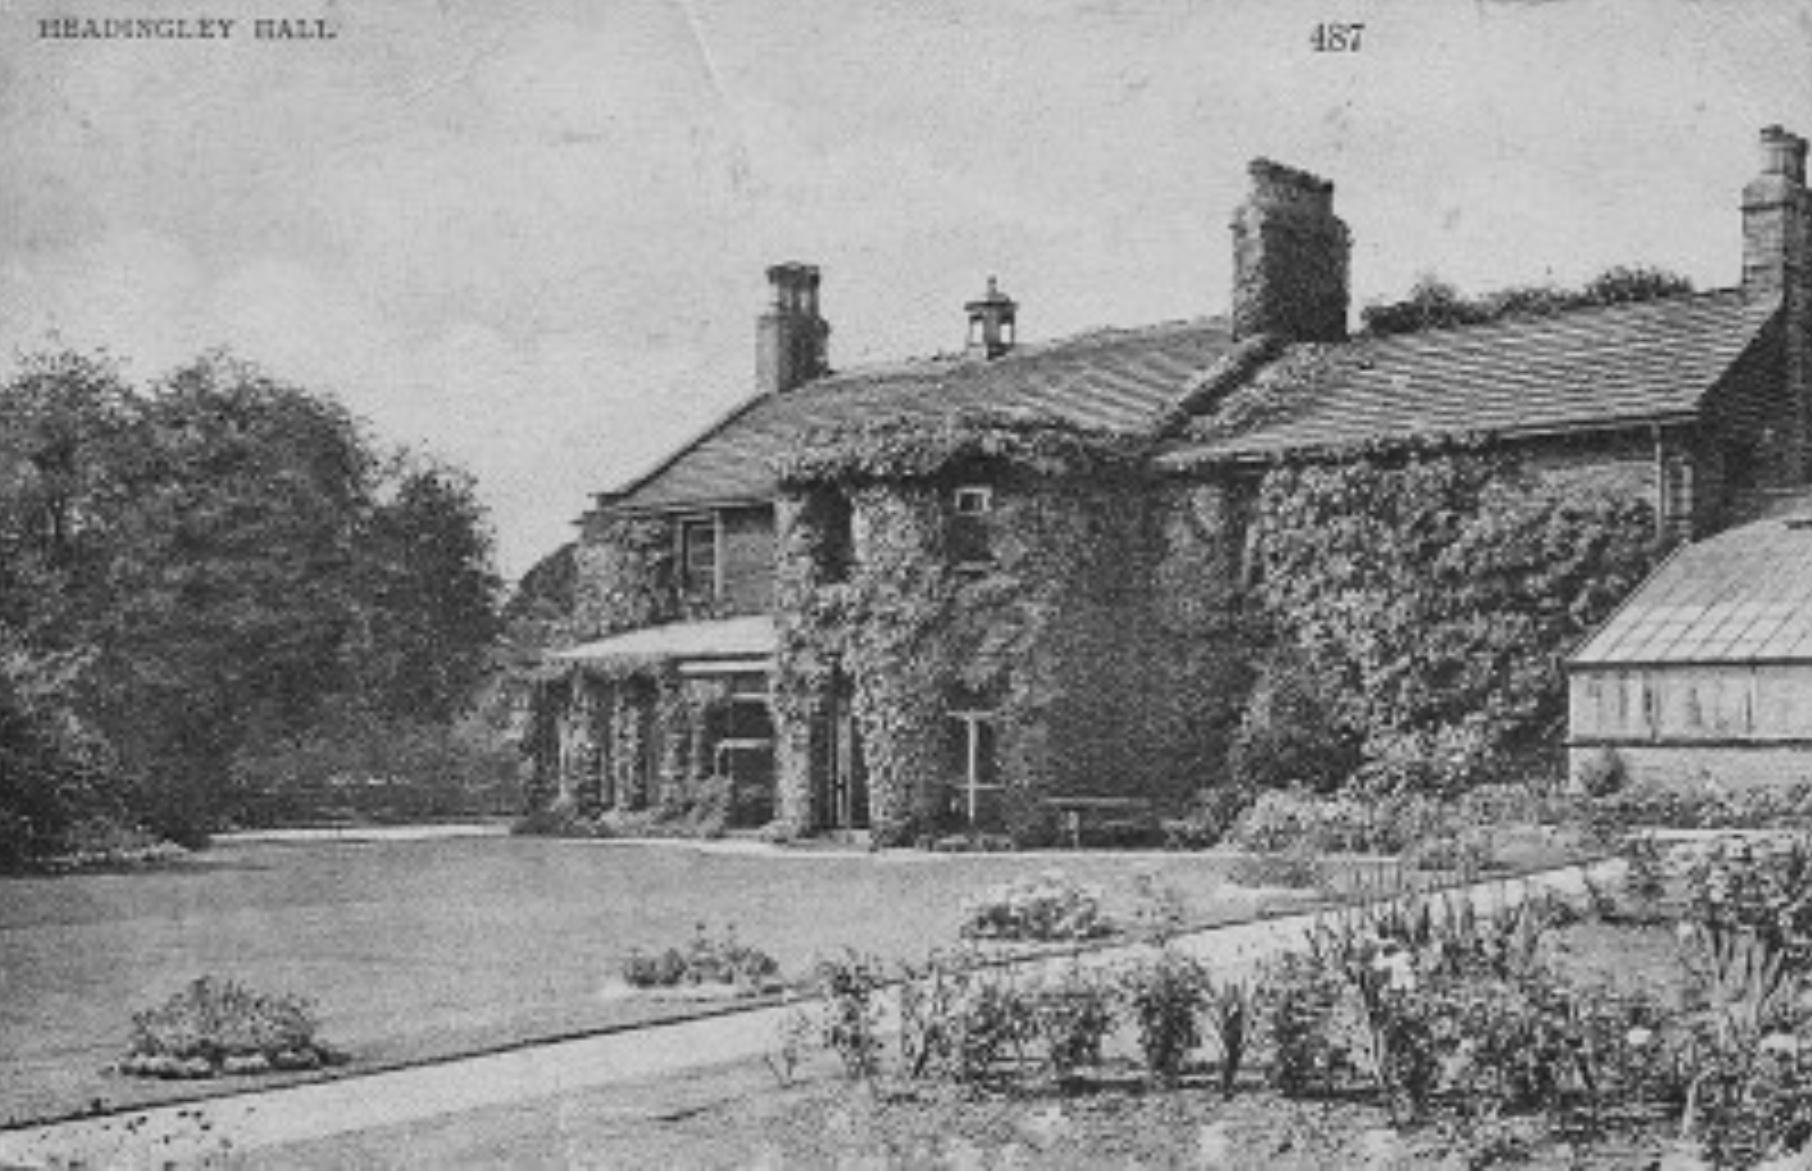 Headingley Hall, undated